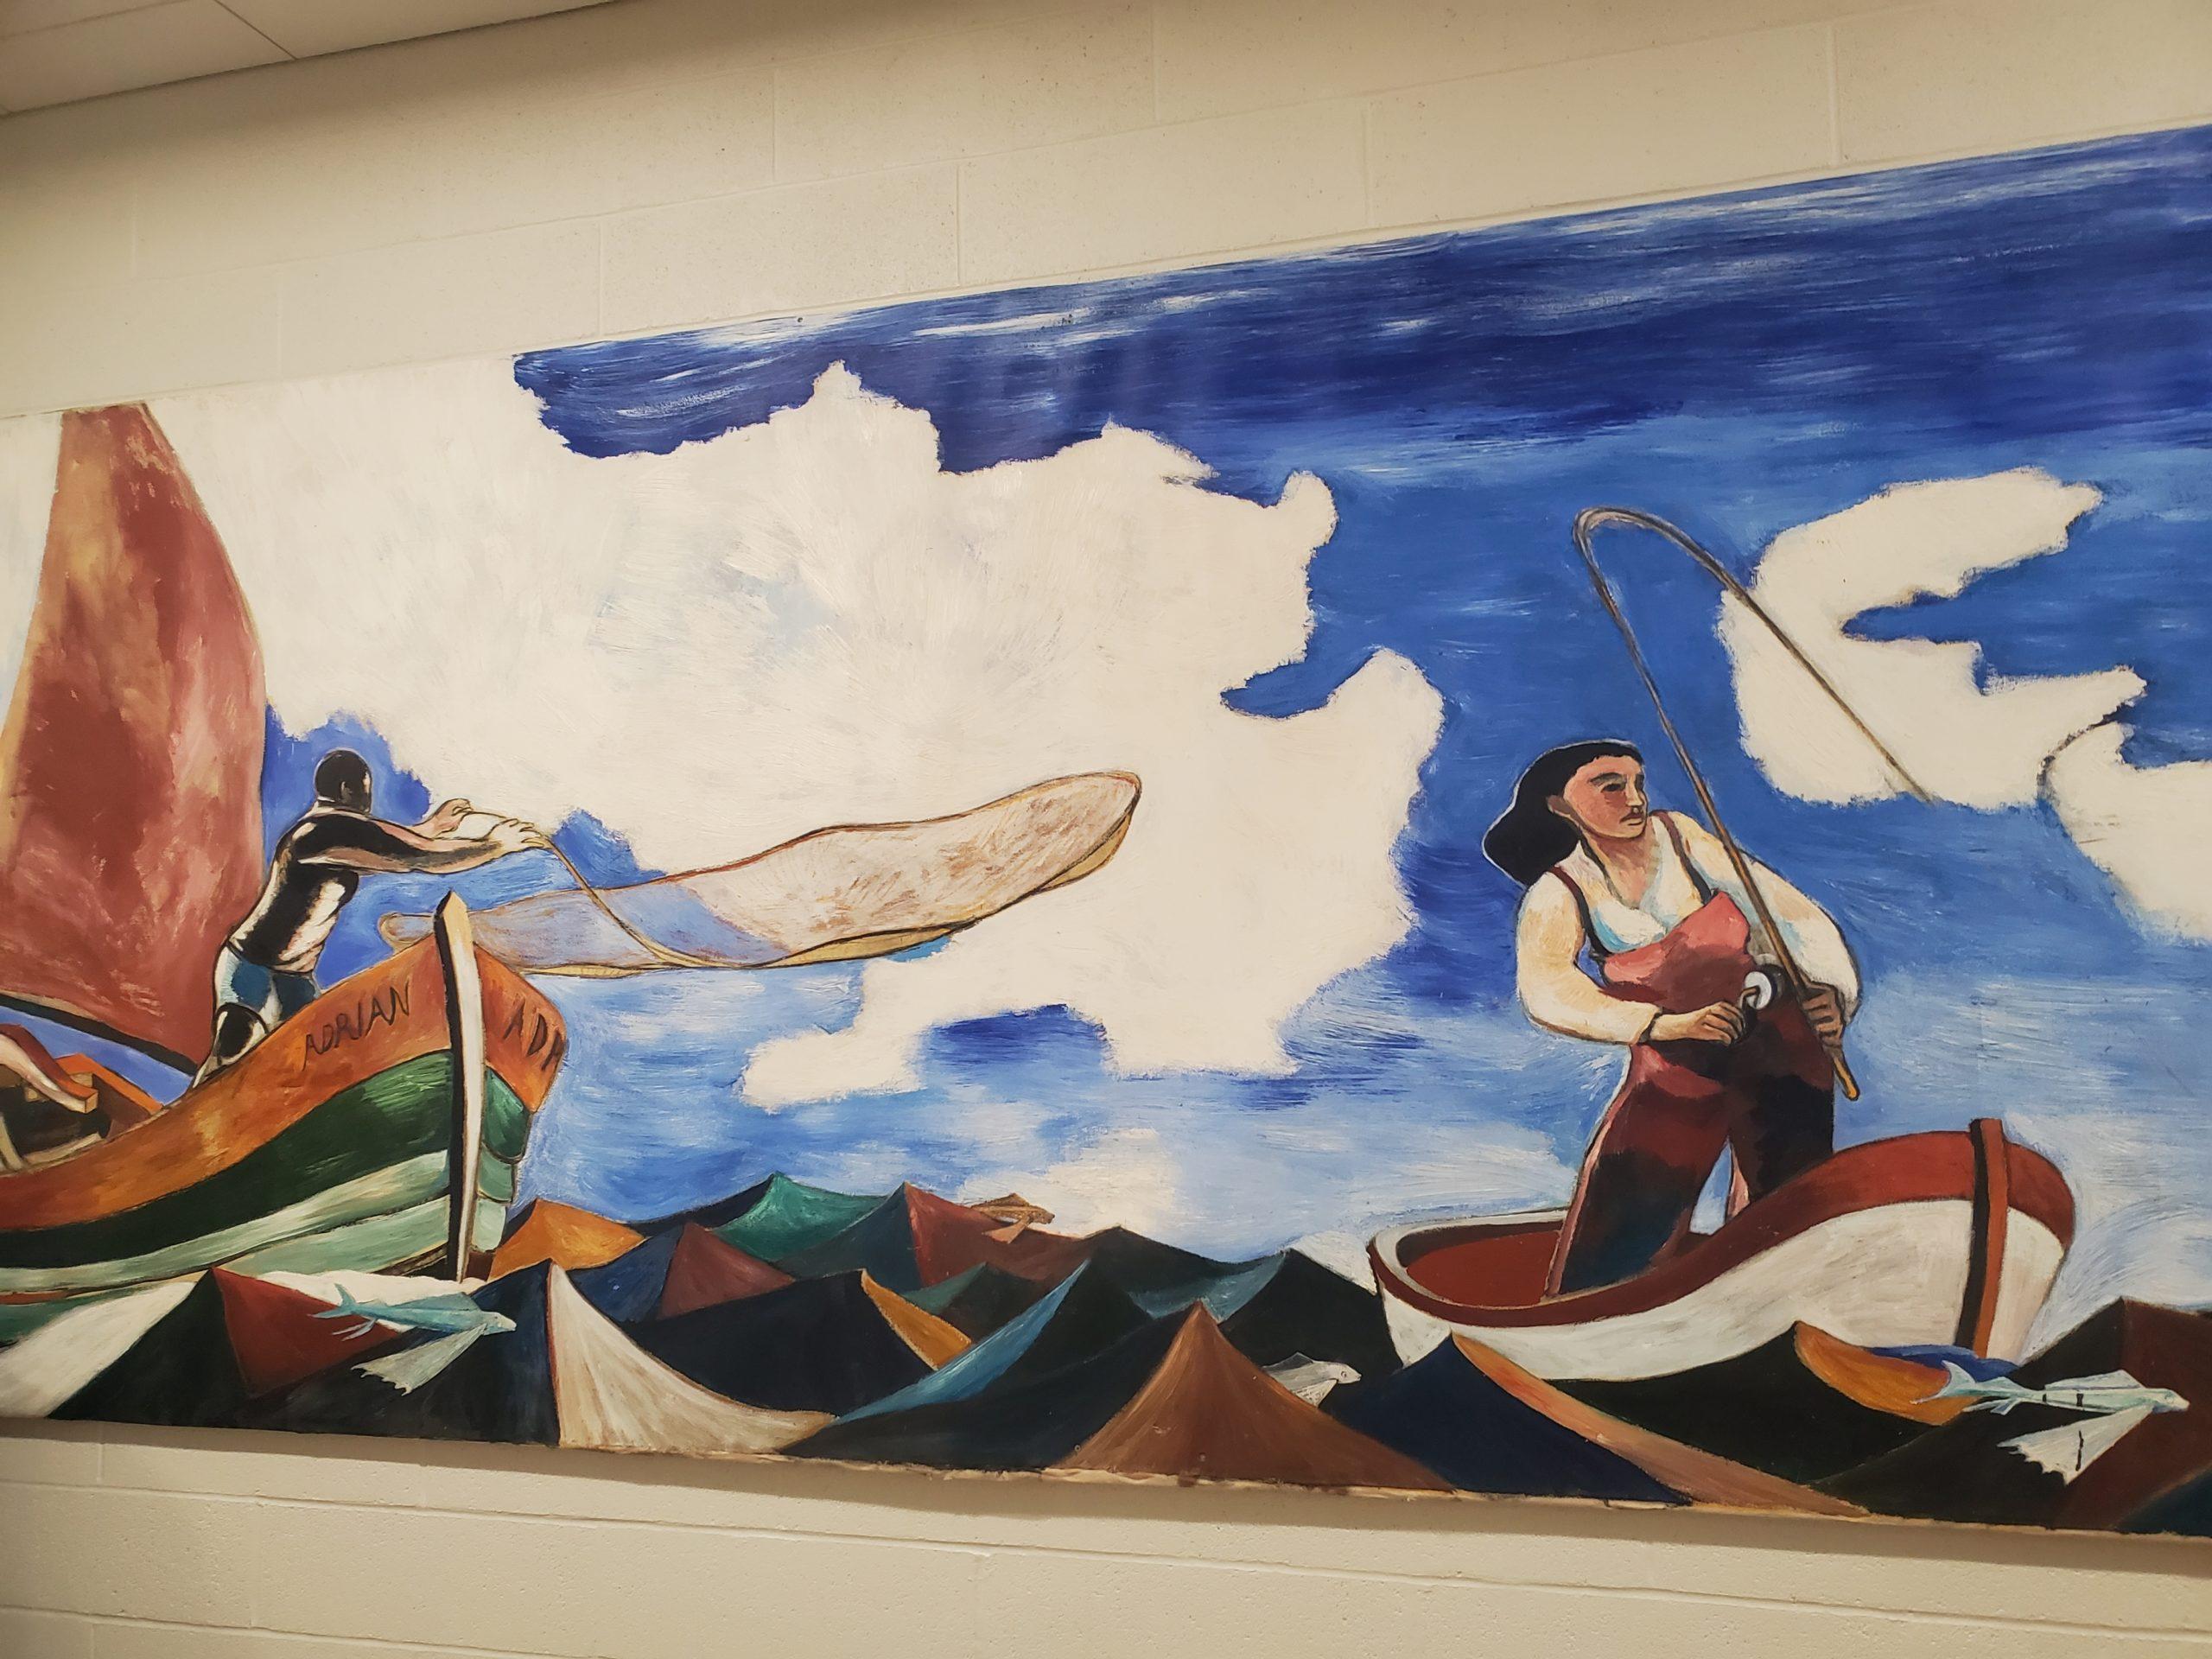 Richard Durkin donated this mural painted by artist Paton Miller to Bridgehampton School.